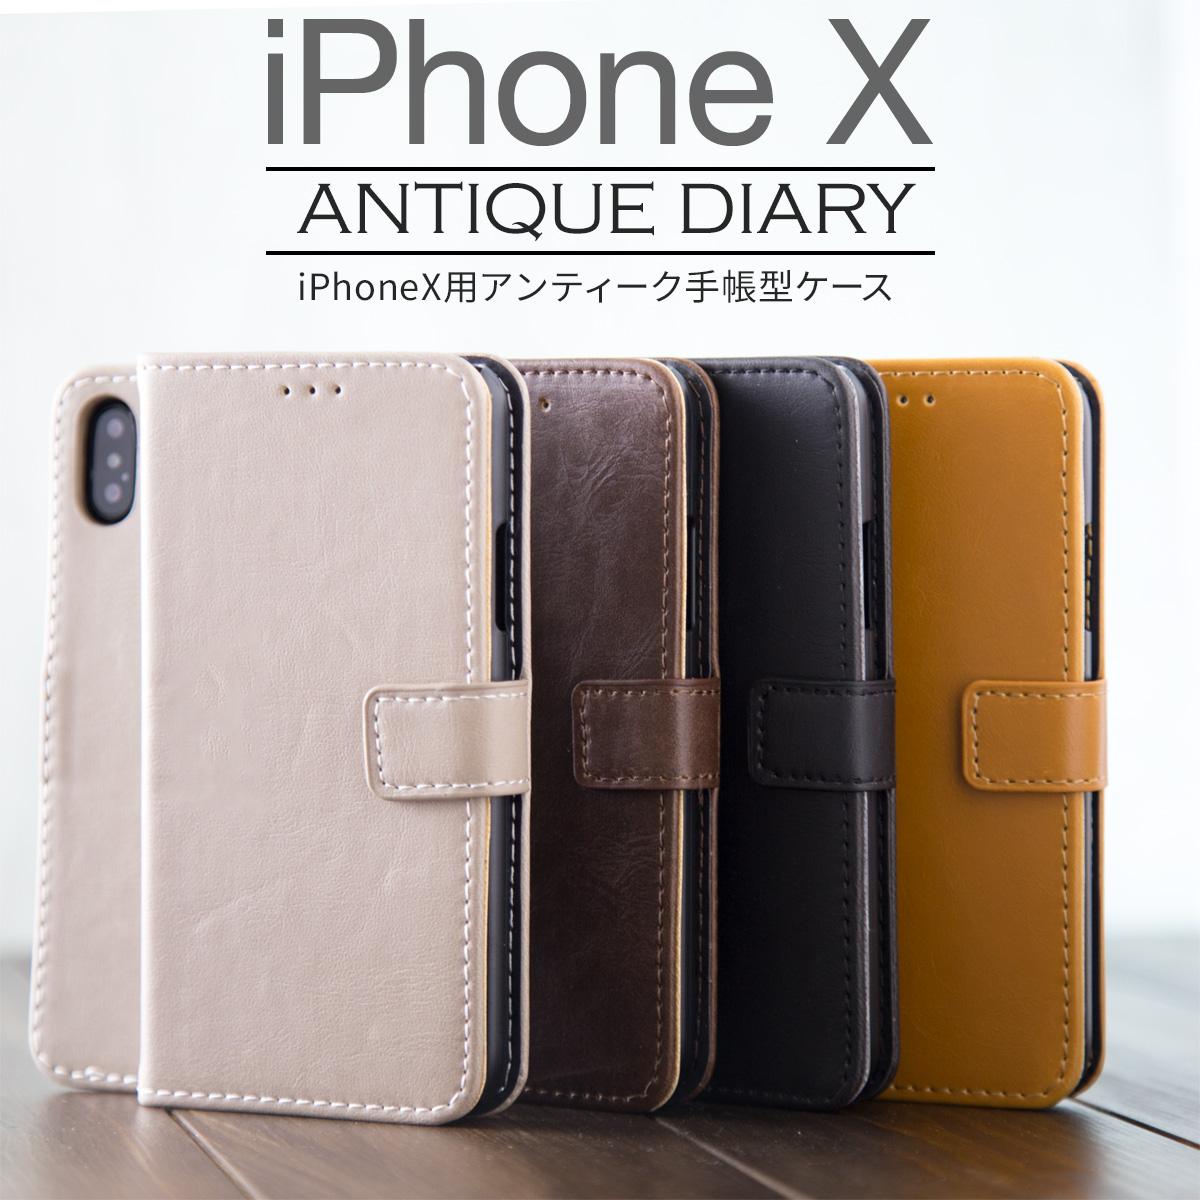 iPhoneX アンティークレザー手帳型ケース